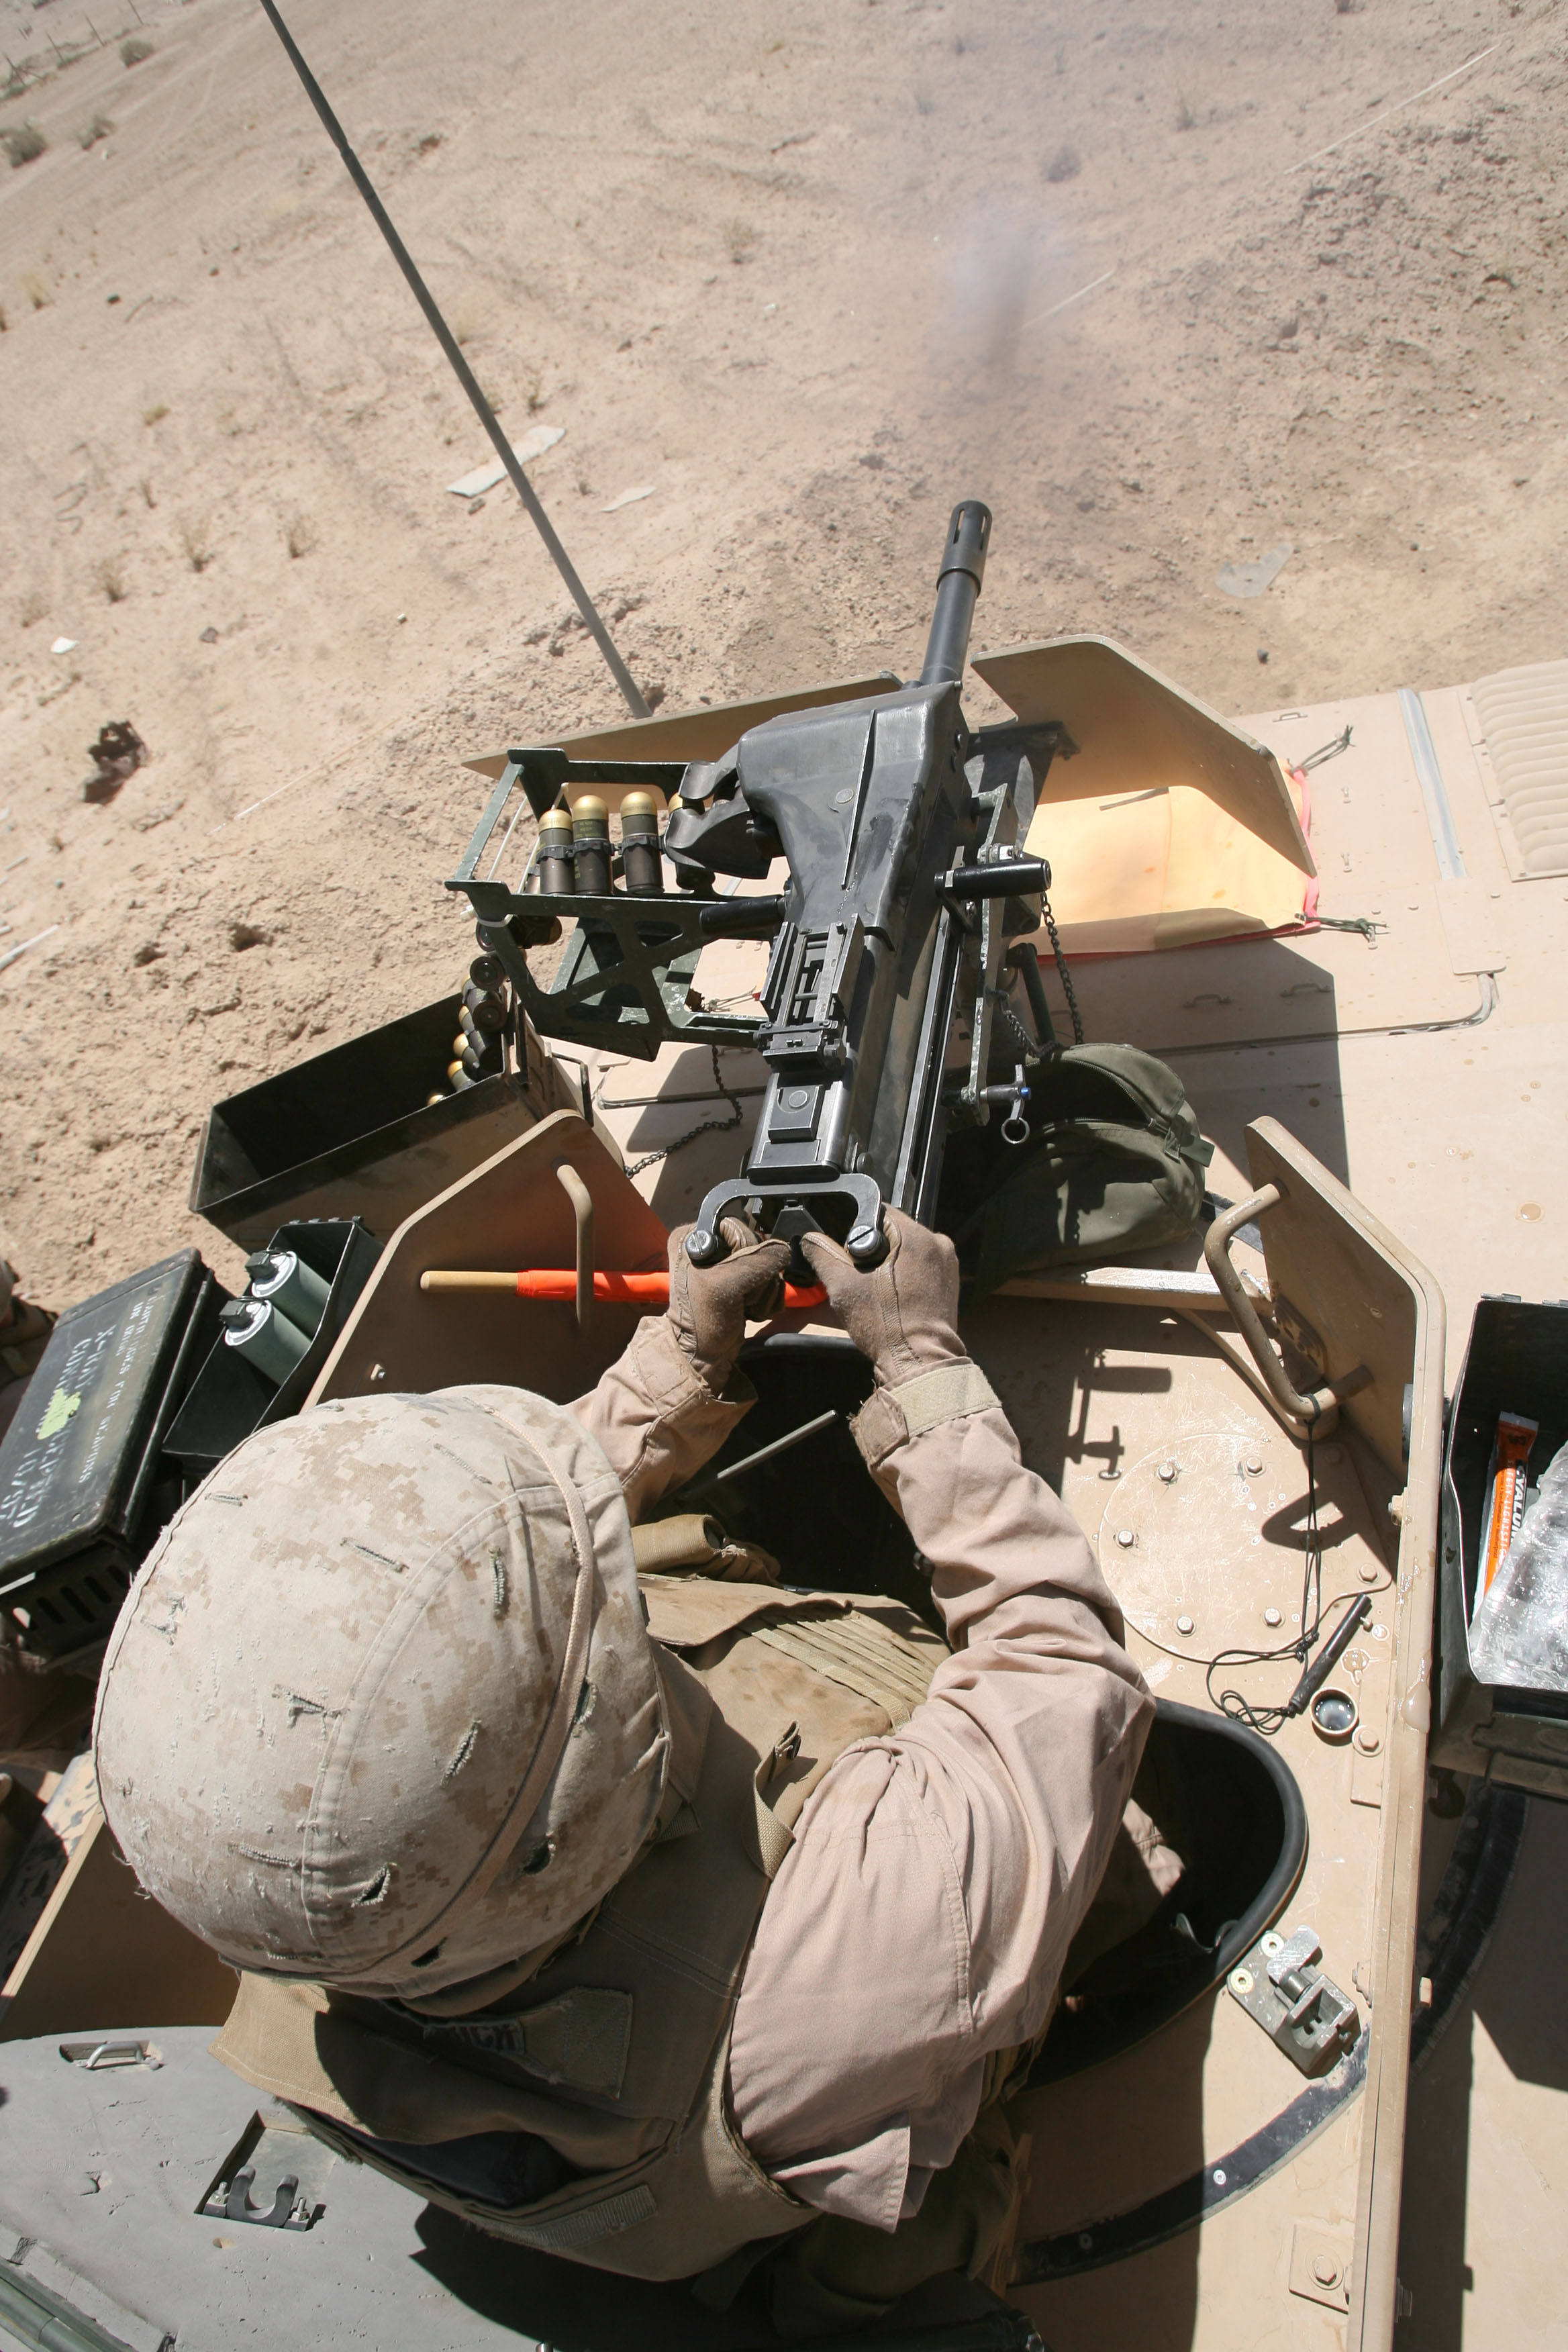 File:40 mm Mk 19 Marine Turret.jpg - Wikimedia Commons